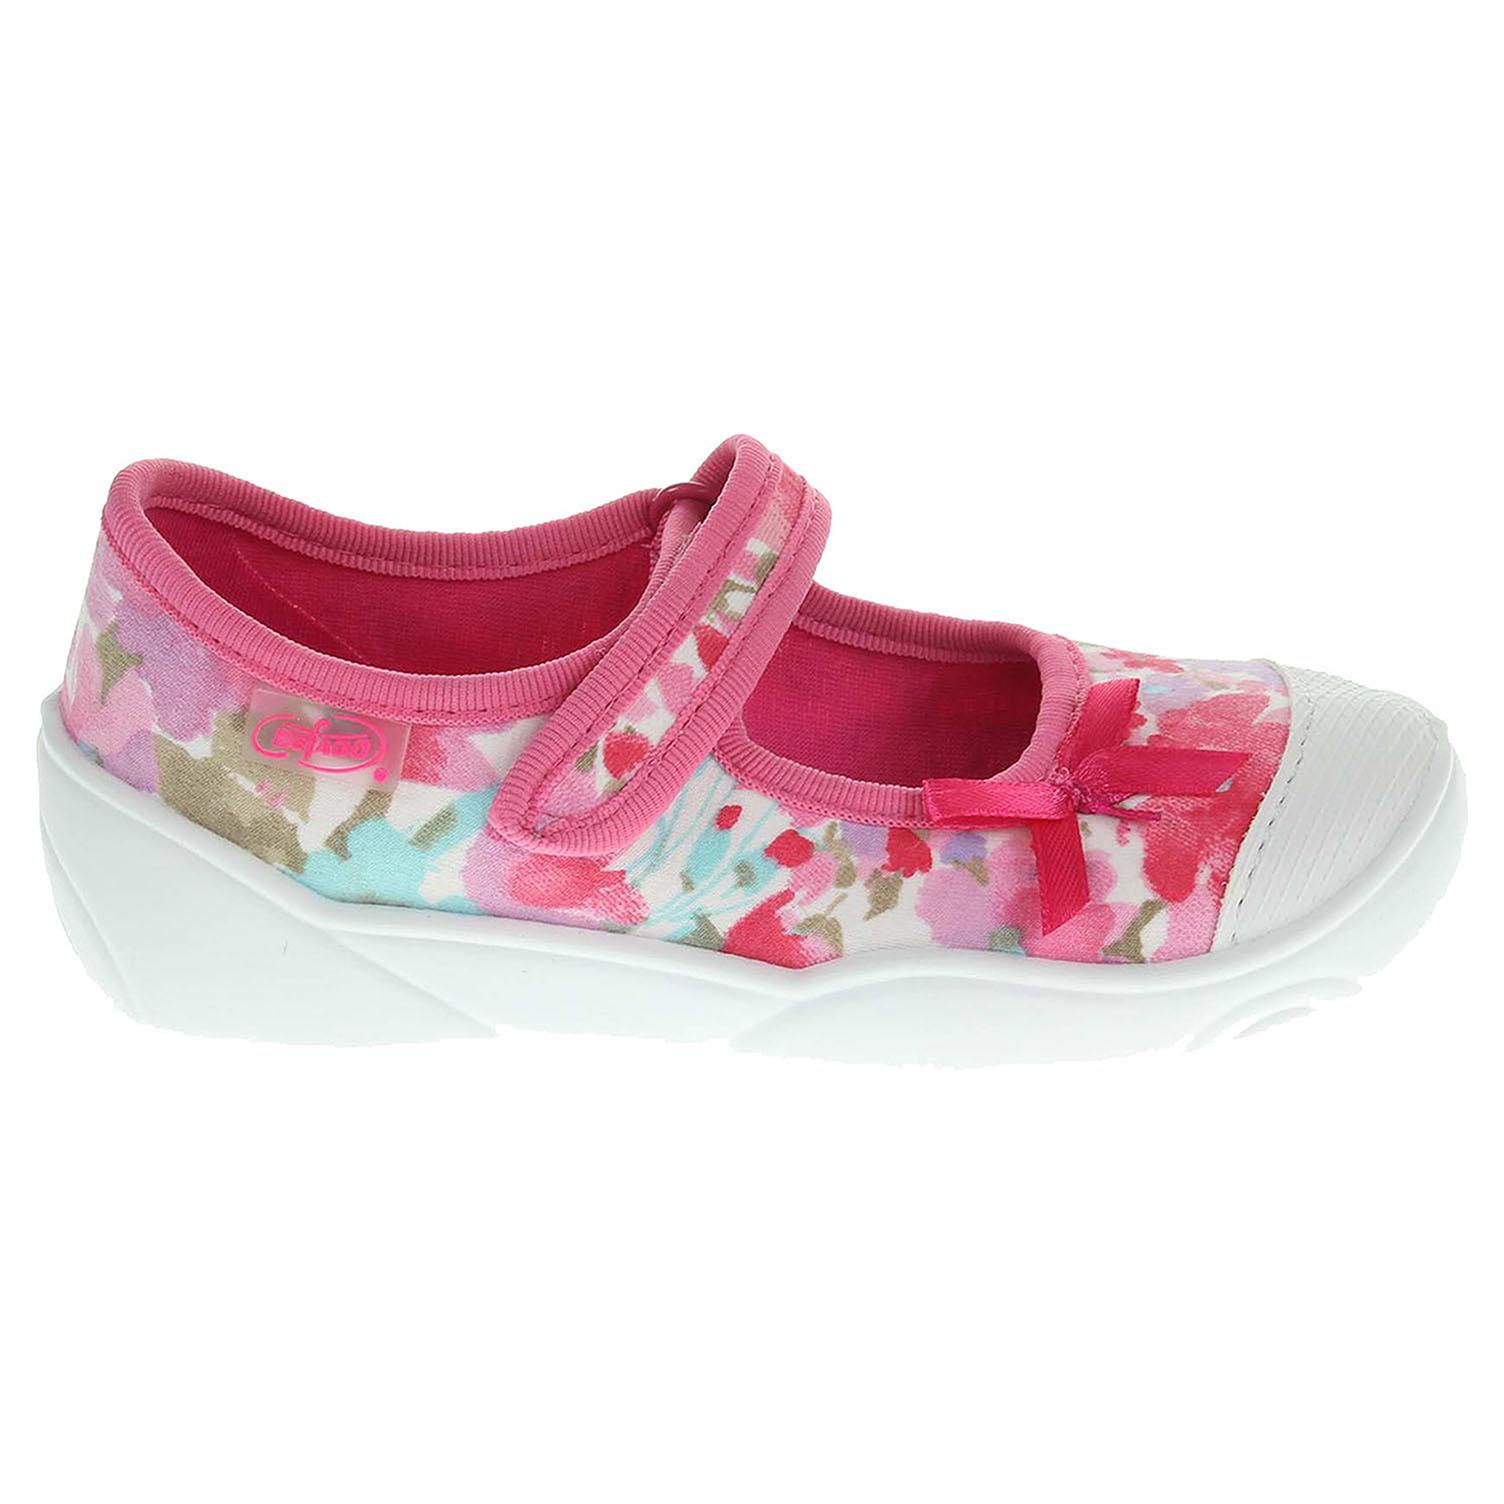 Befado dívčí baleriny 209P020 růžové 23